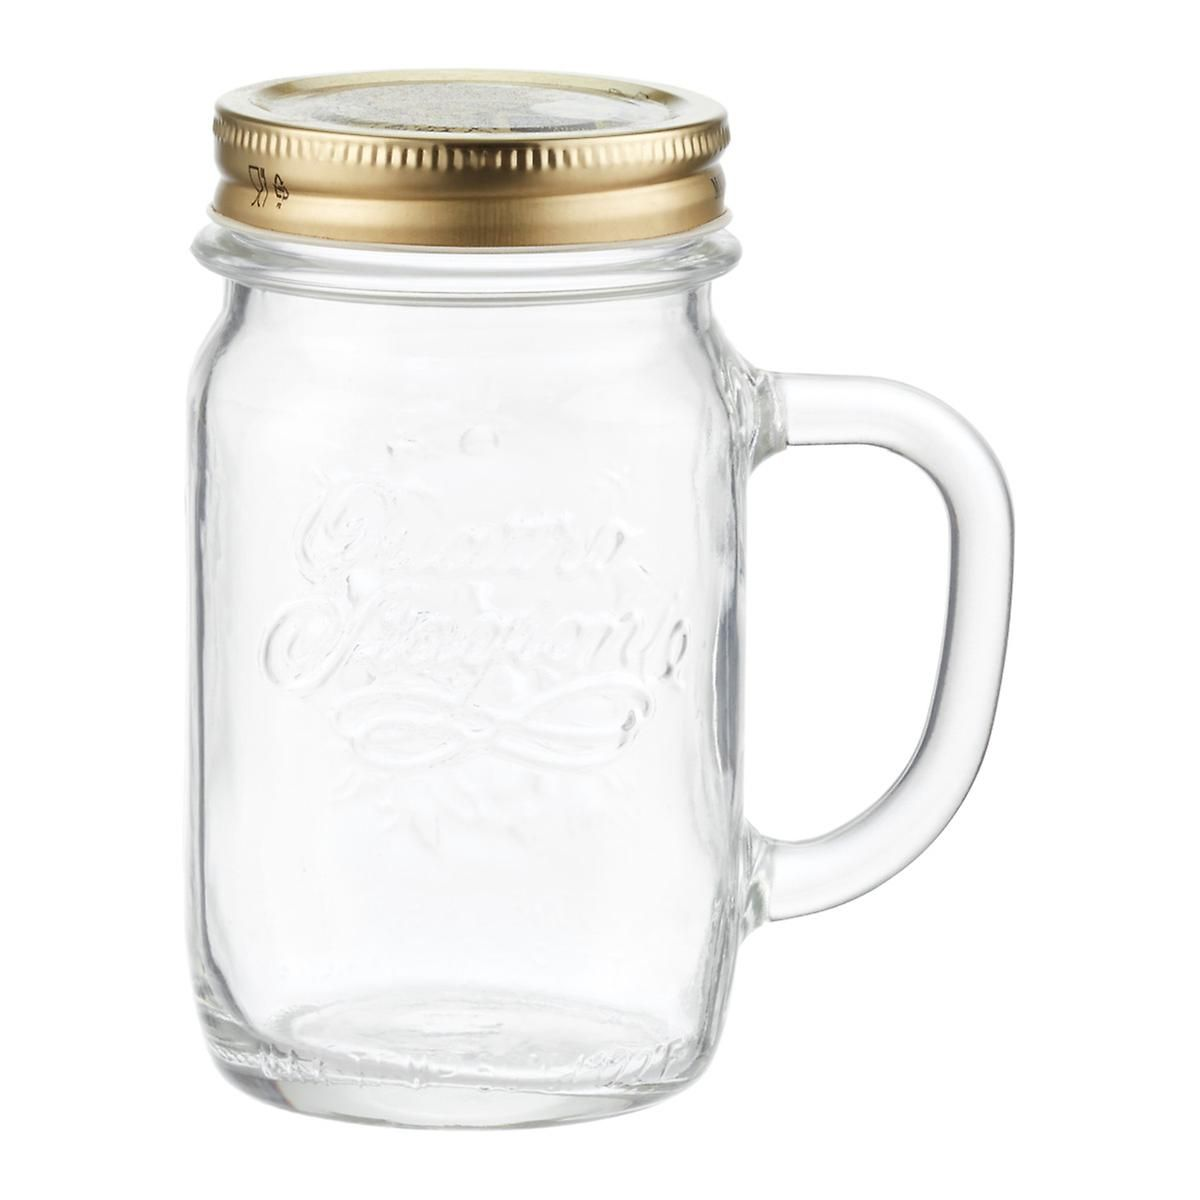 Quattro Stagioni 14 Oz Handled Mug Glass Jars With Lids Glass Jars Mugs